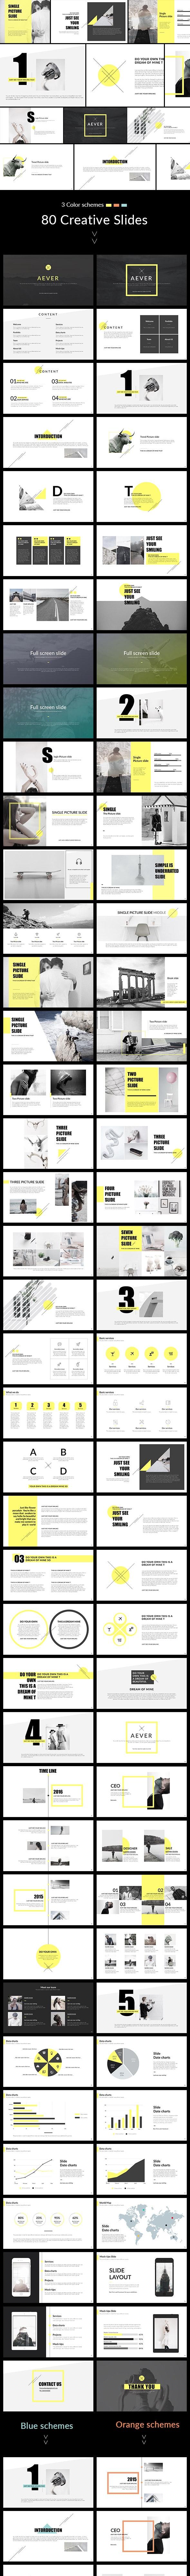 AEVER - Clean & Simple Keynote Template - Creative Keynote Templates